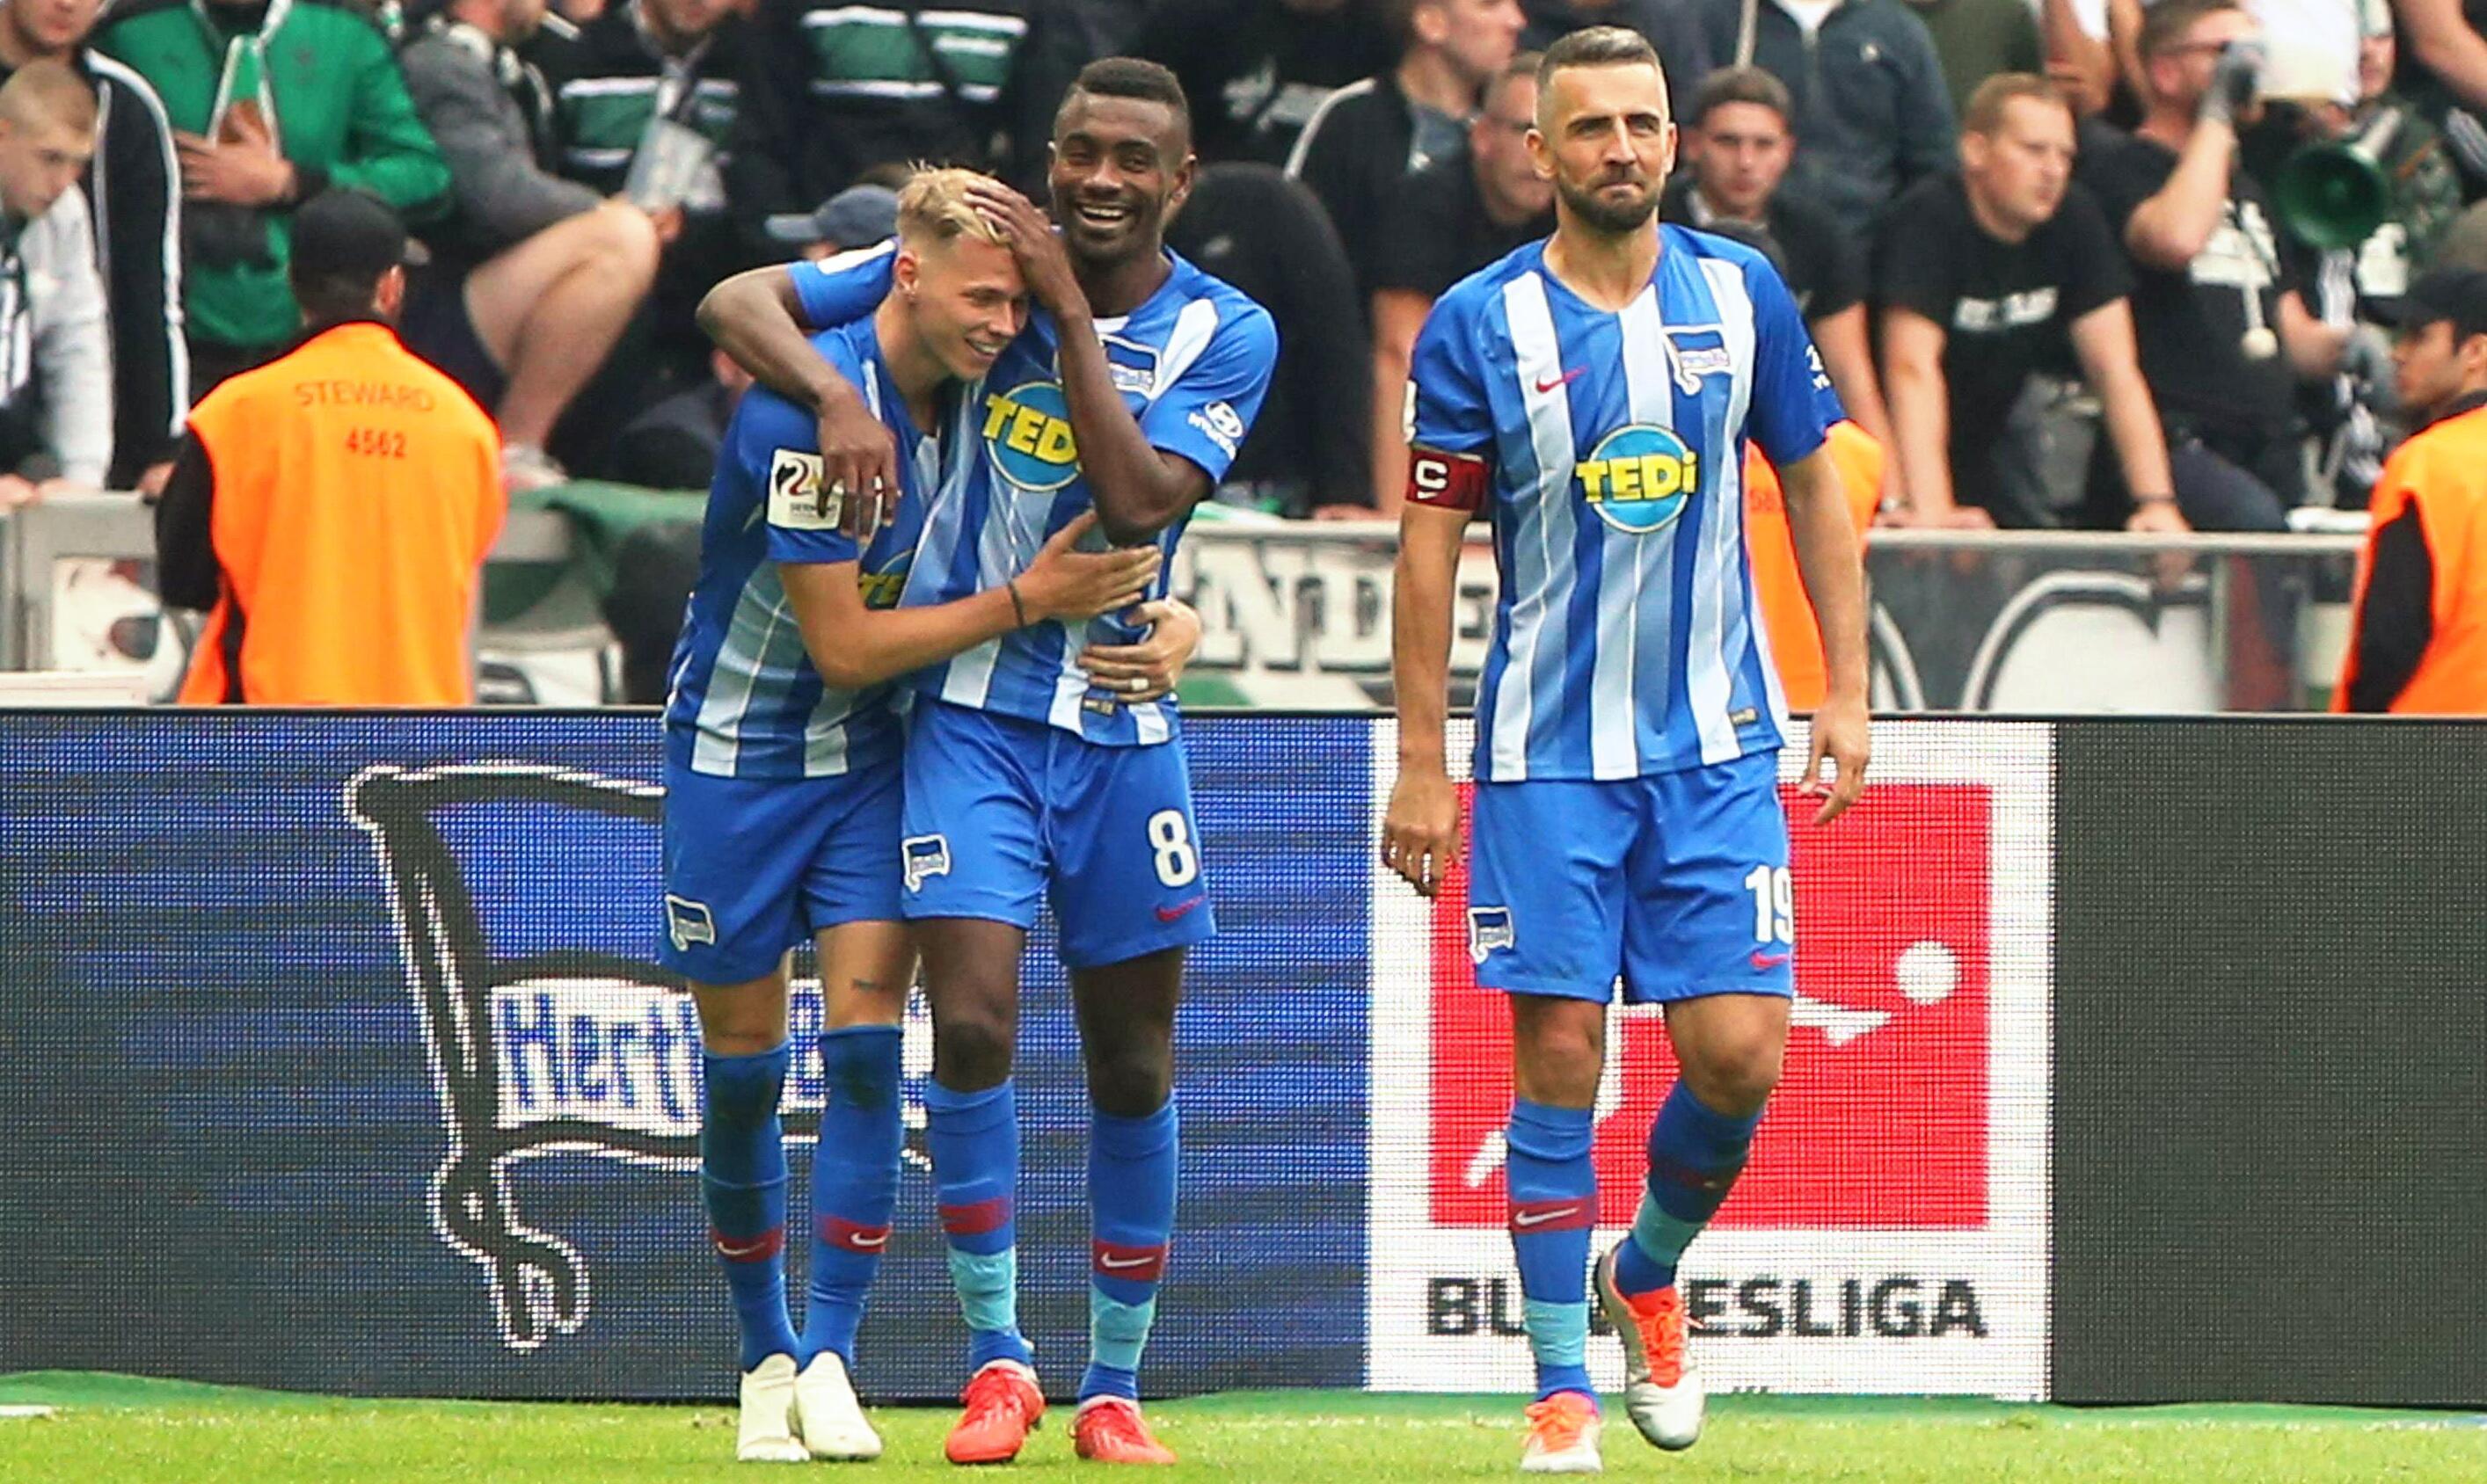 Bild zu Fußball, Bundesliga, Hertha BSC, Duda, Kalou, Ibisevic